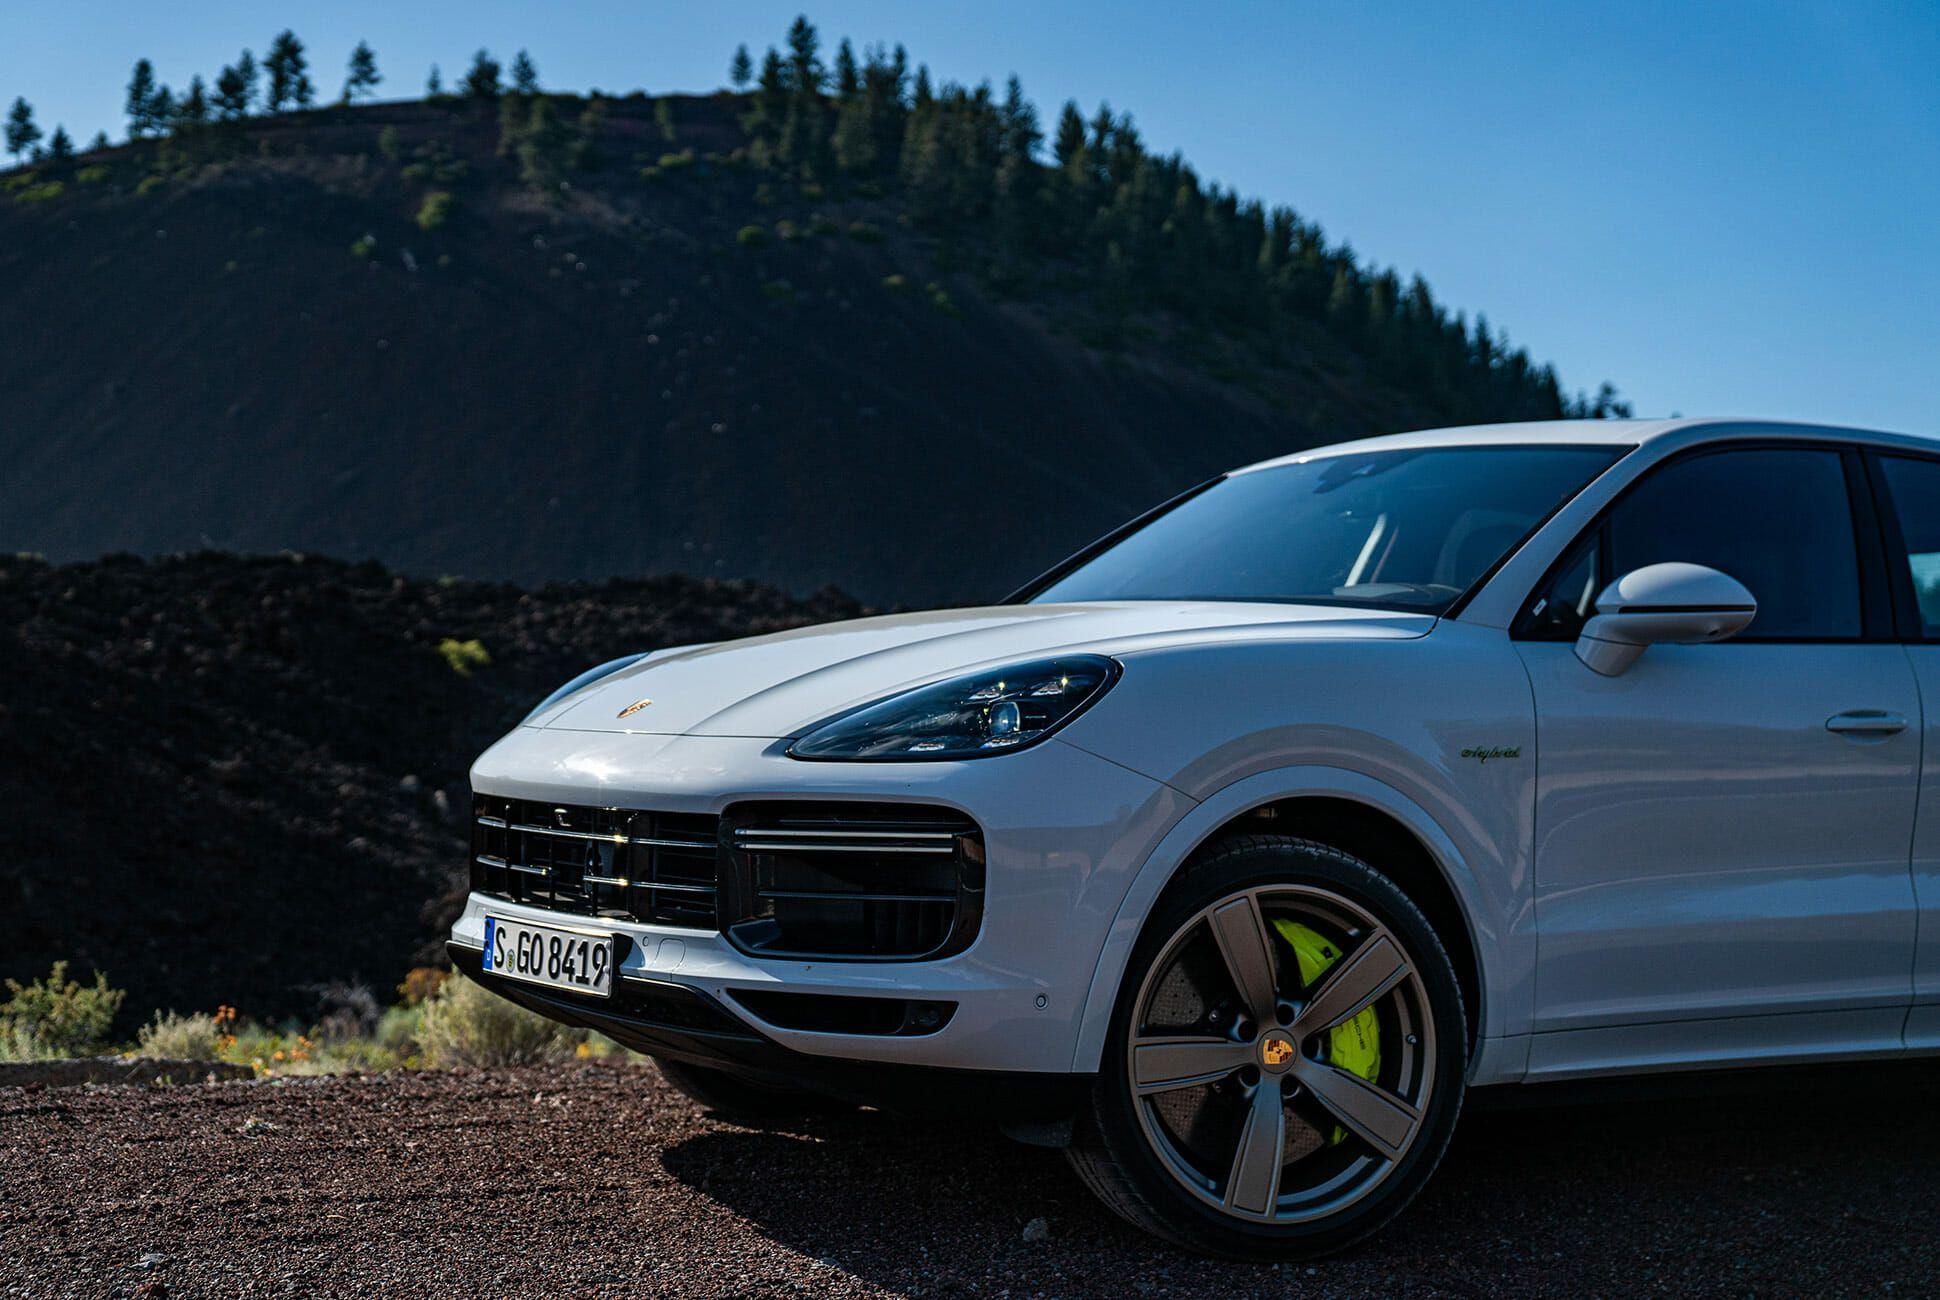 Pair-of-High-Tech-Porsche-Cayenne-Hybrids-gear-patrol-Lava-ambience-7